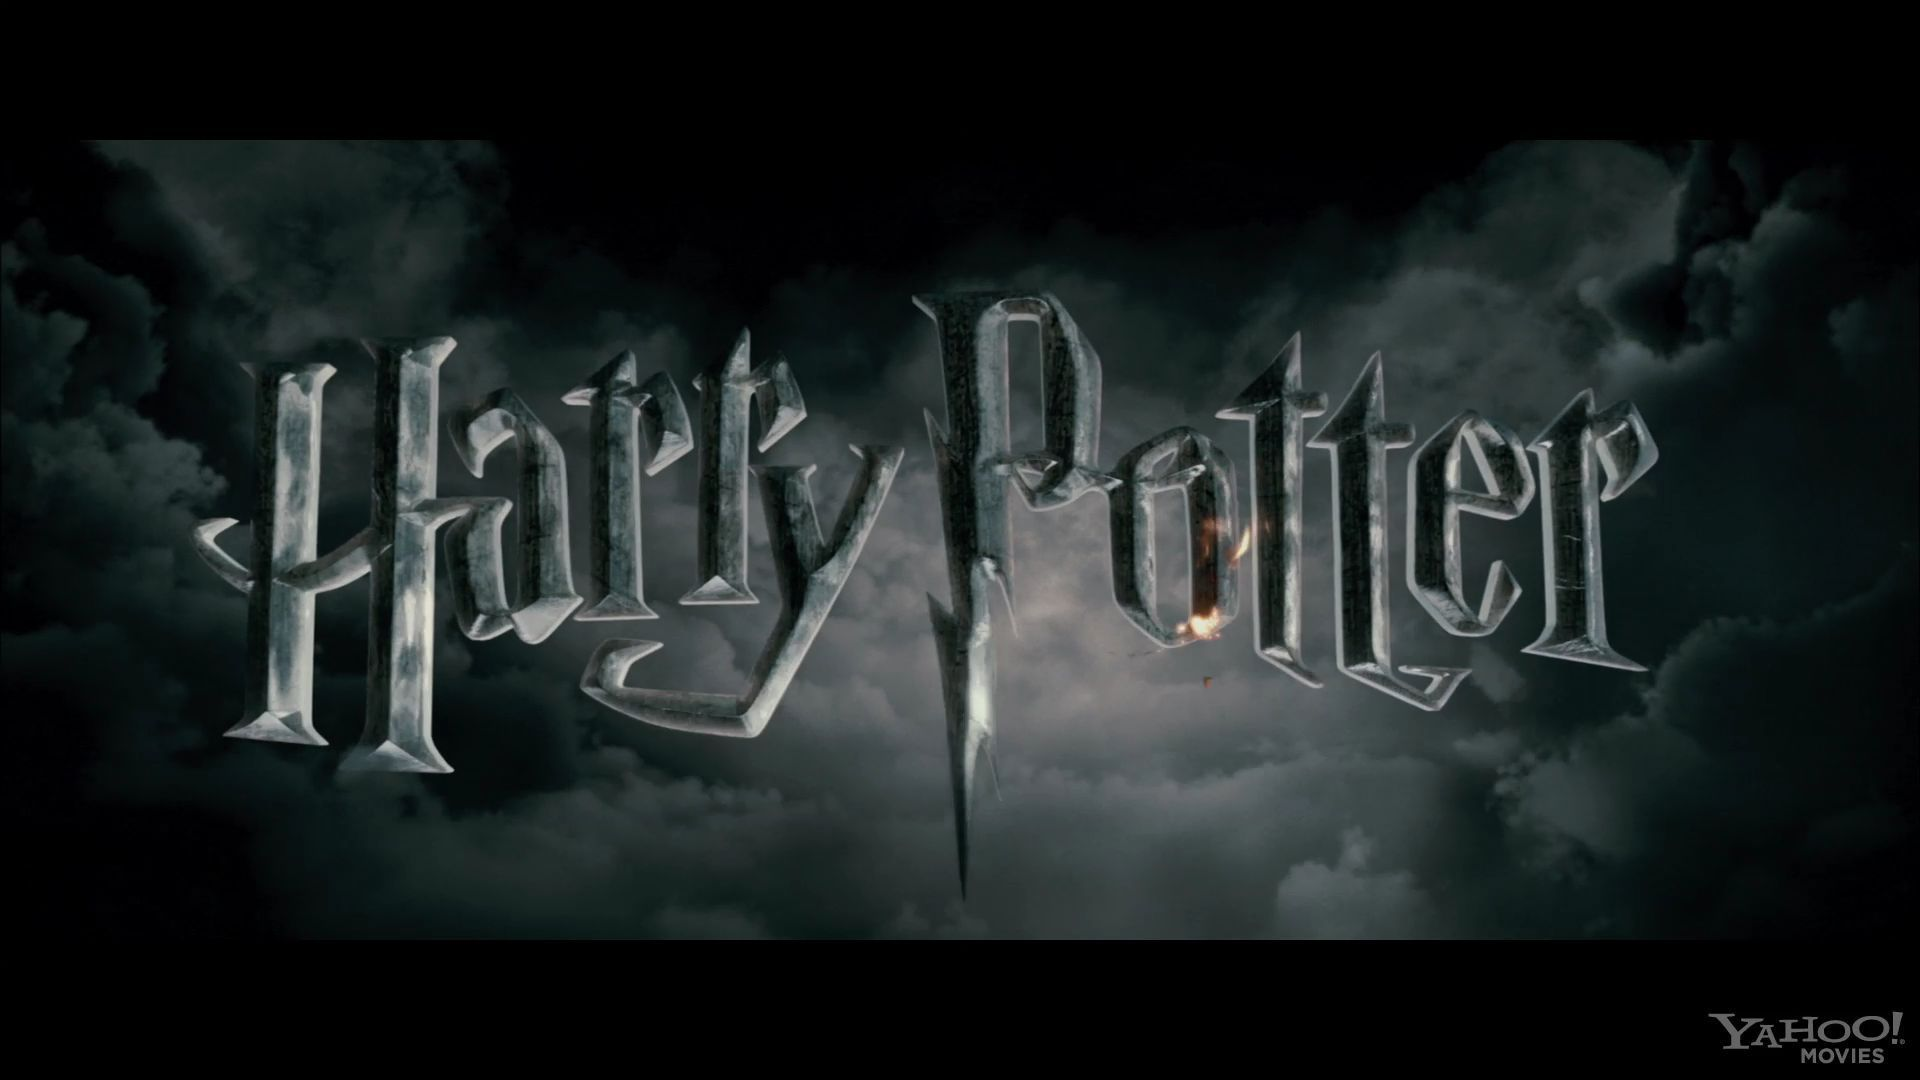 Harry Potter Logos